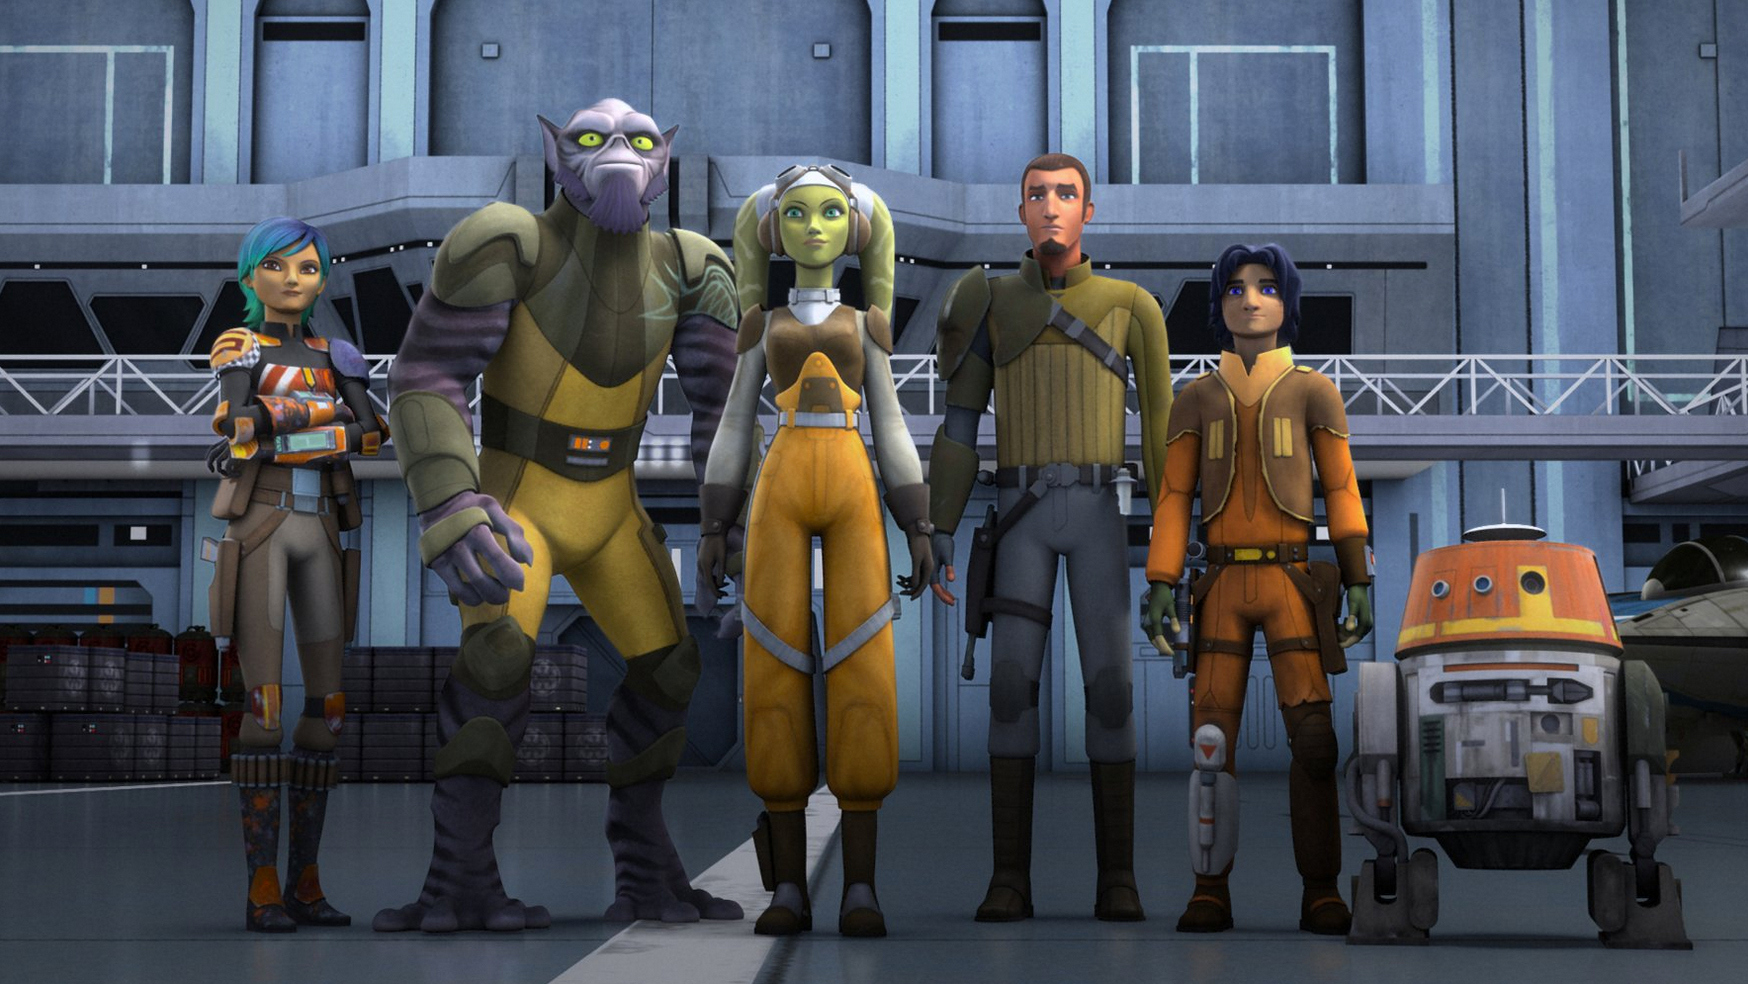 Star Wars Rebels (2014) Titles: Star Wars Rebels, Homecoming Characters: Kanan Jarrus, Ezra Bridger, Hera Syndulla, Zeb Orrelios, Sabine Wren Photo by Disney